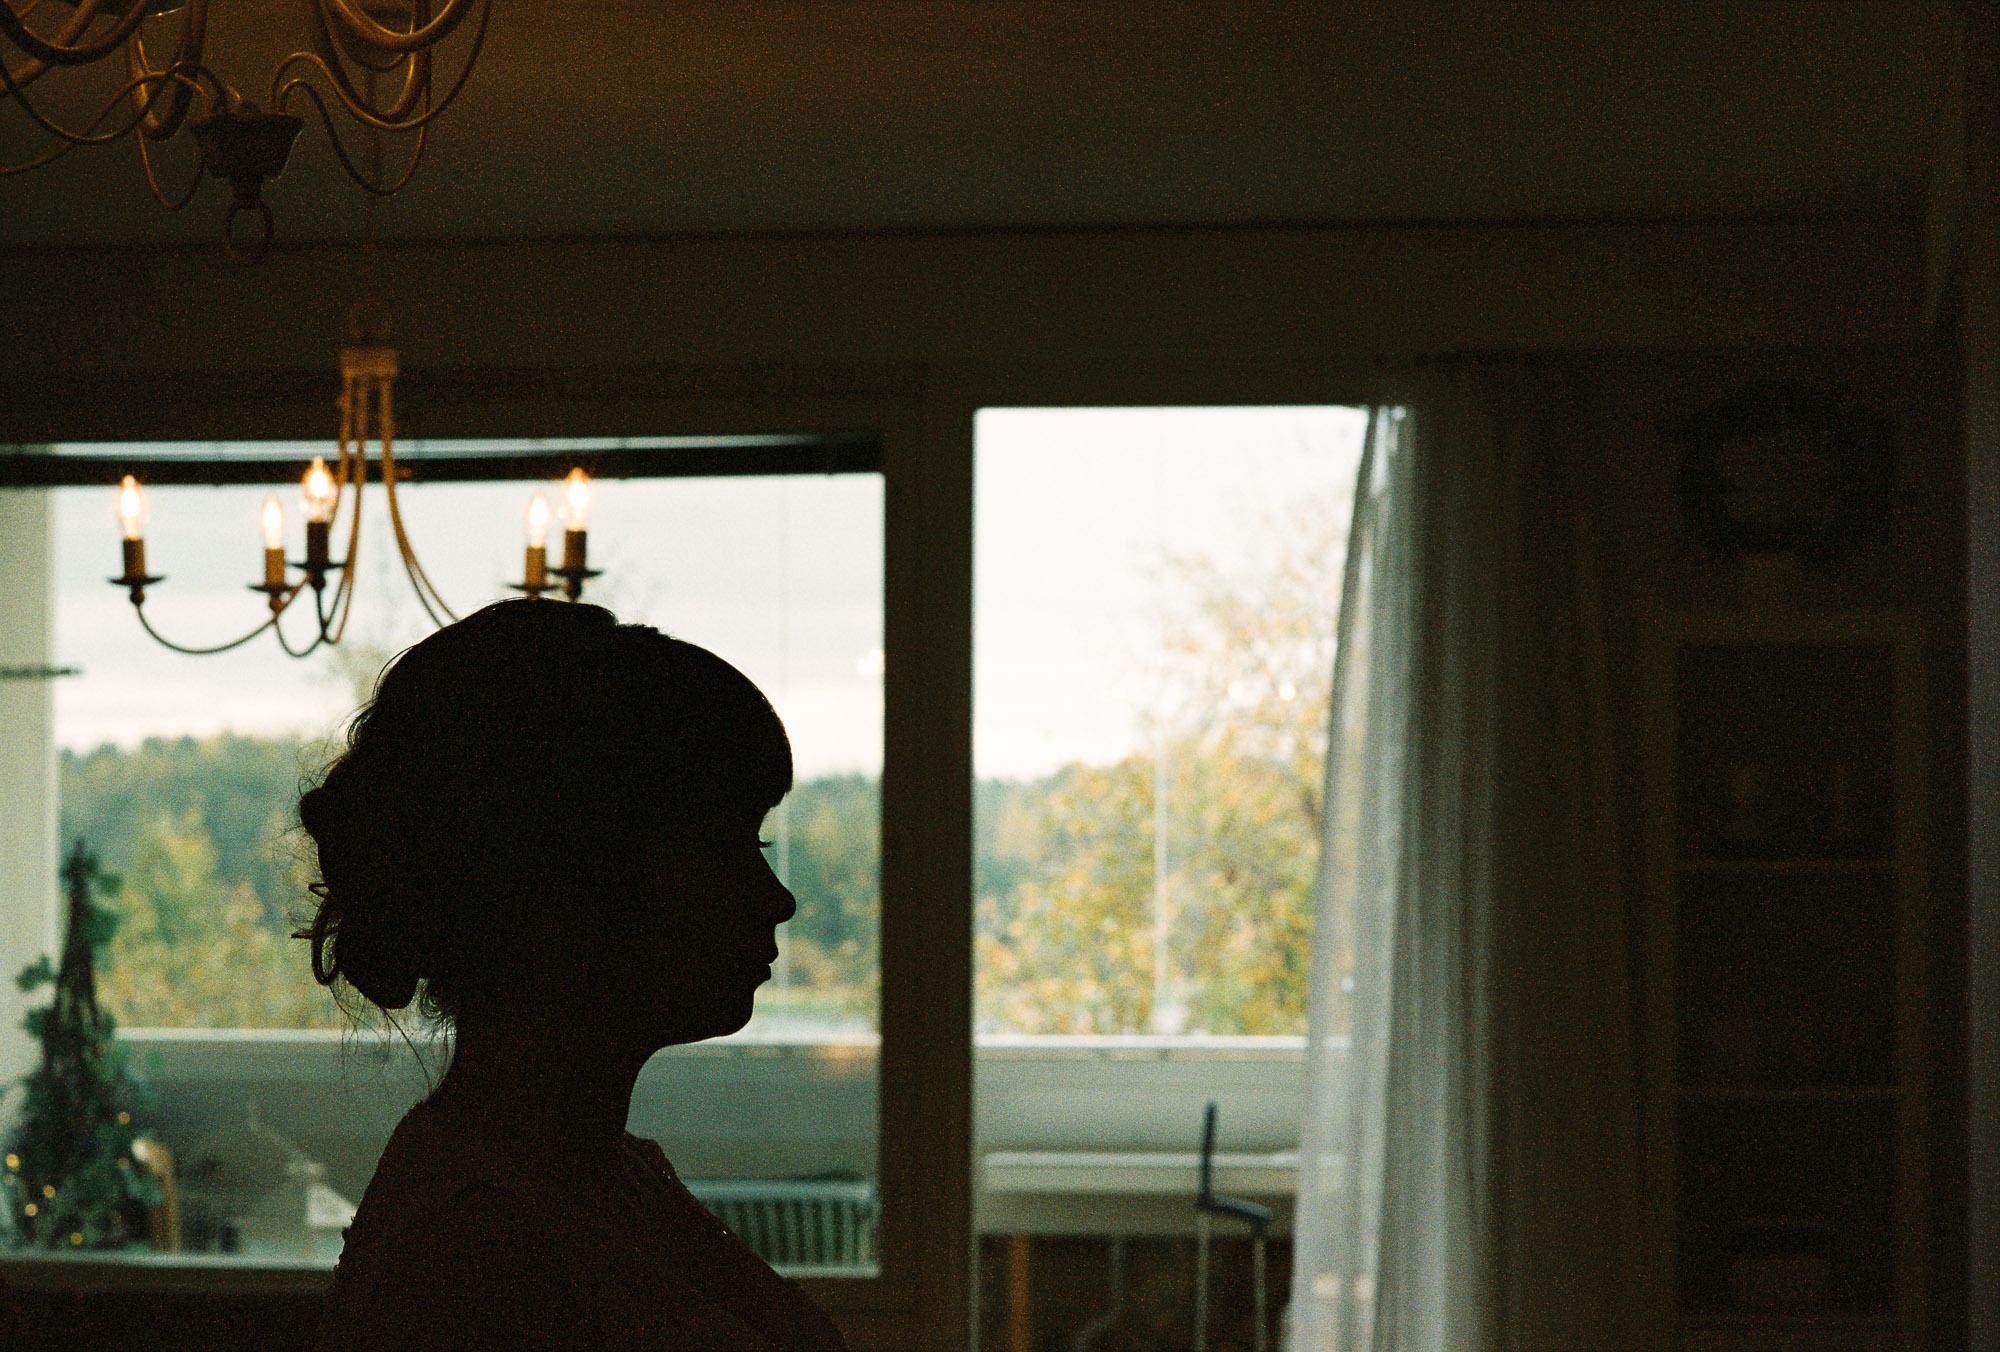 jere-satamo-analog-film-wedding-photographer-finland-026.jpg